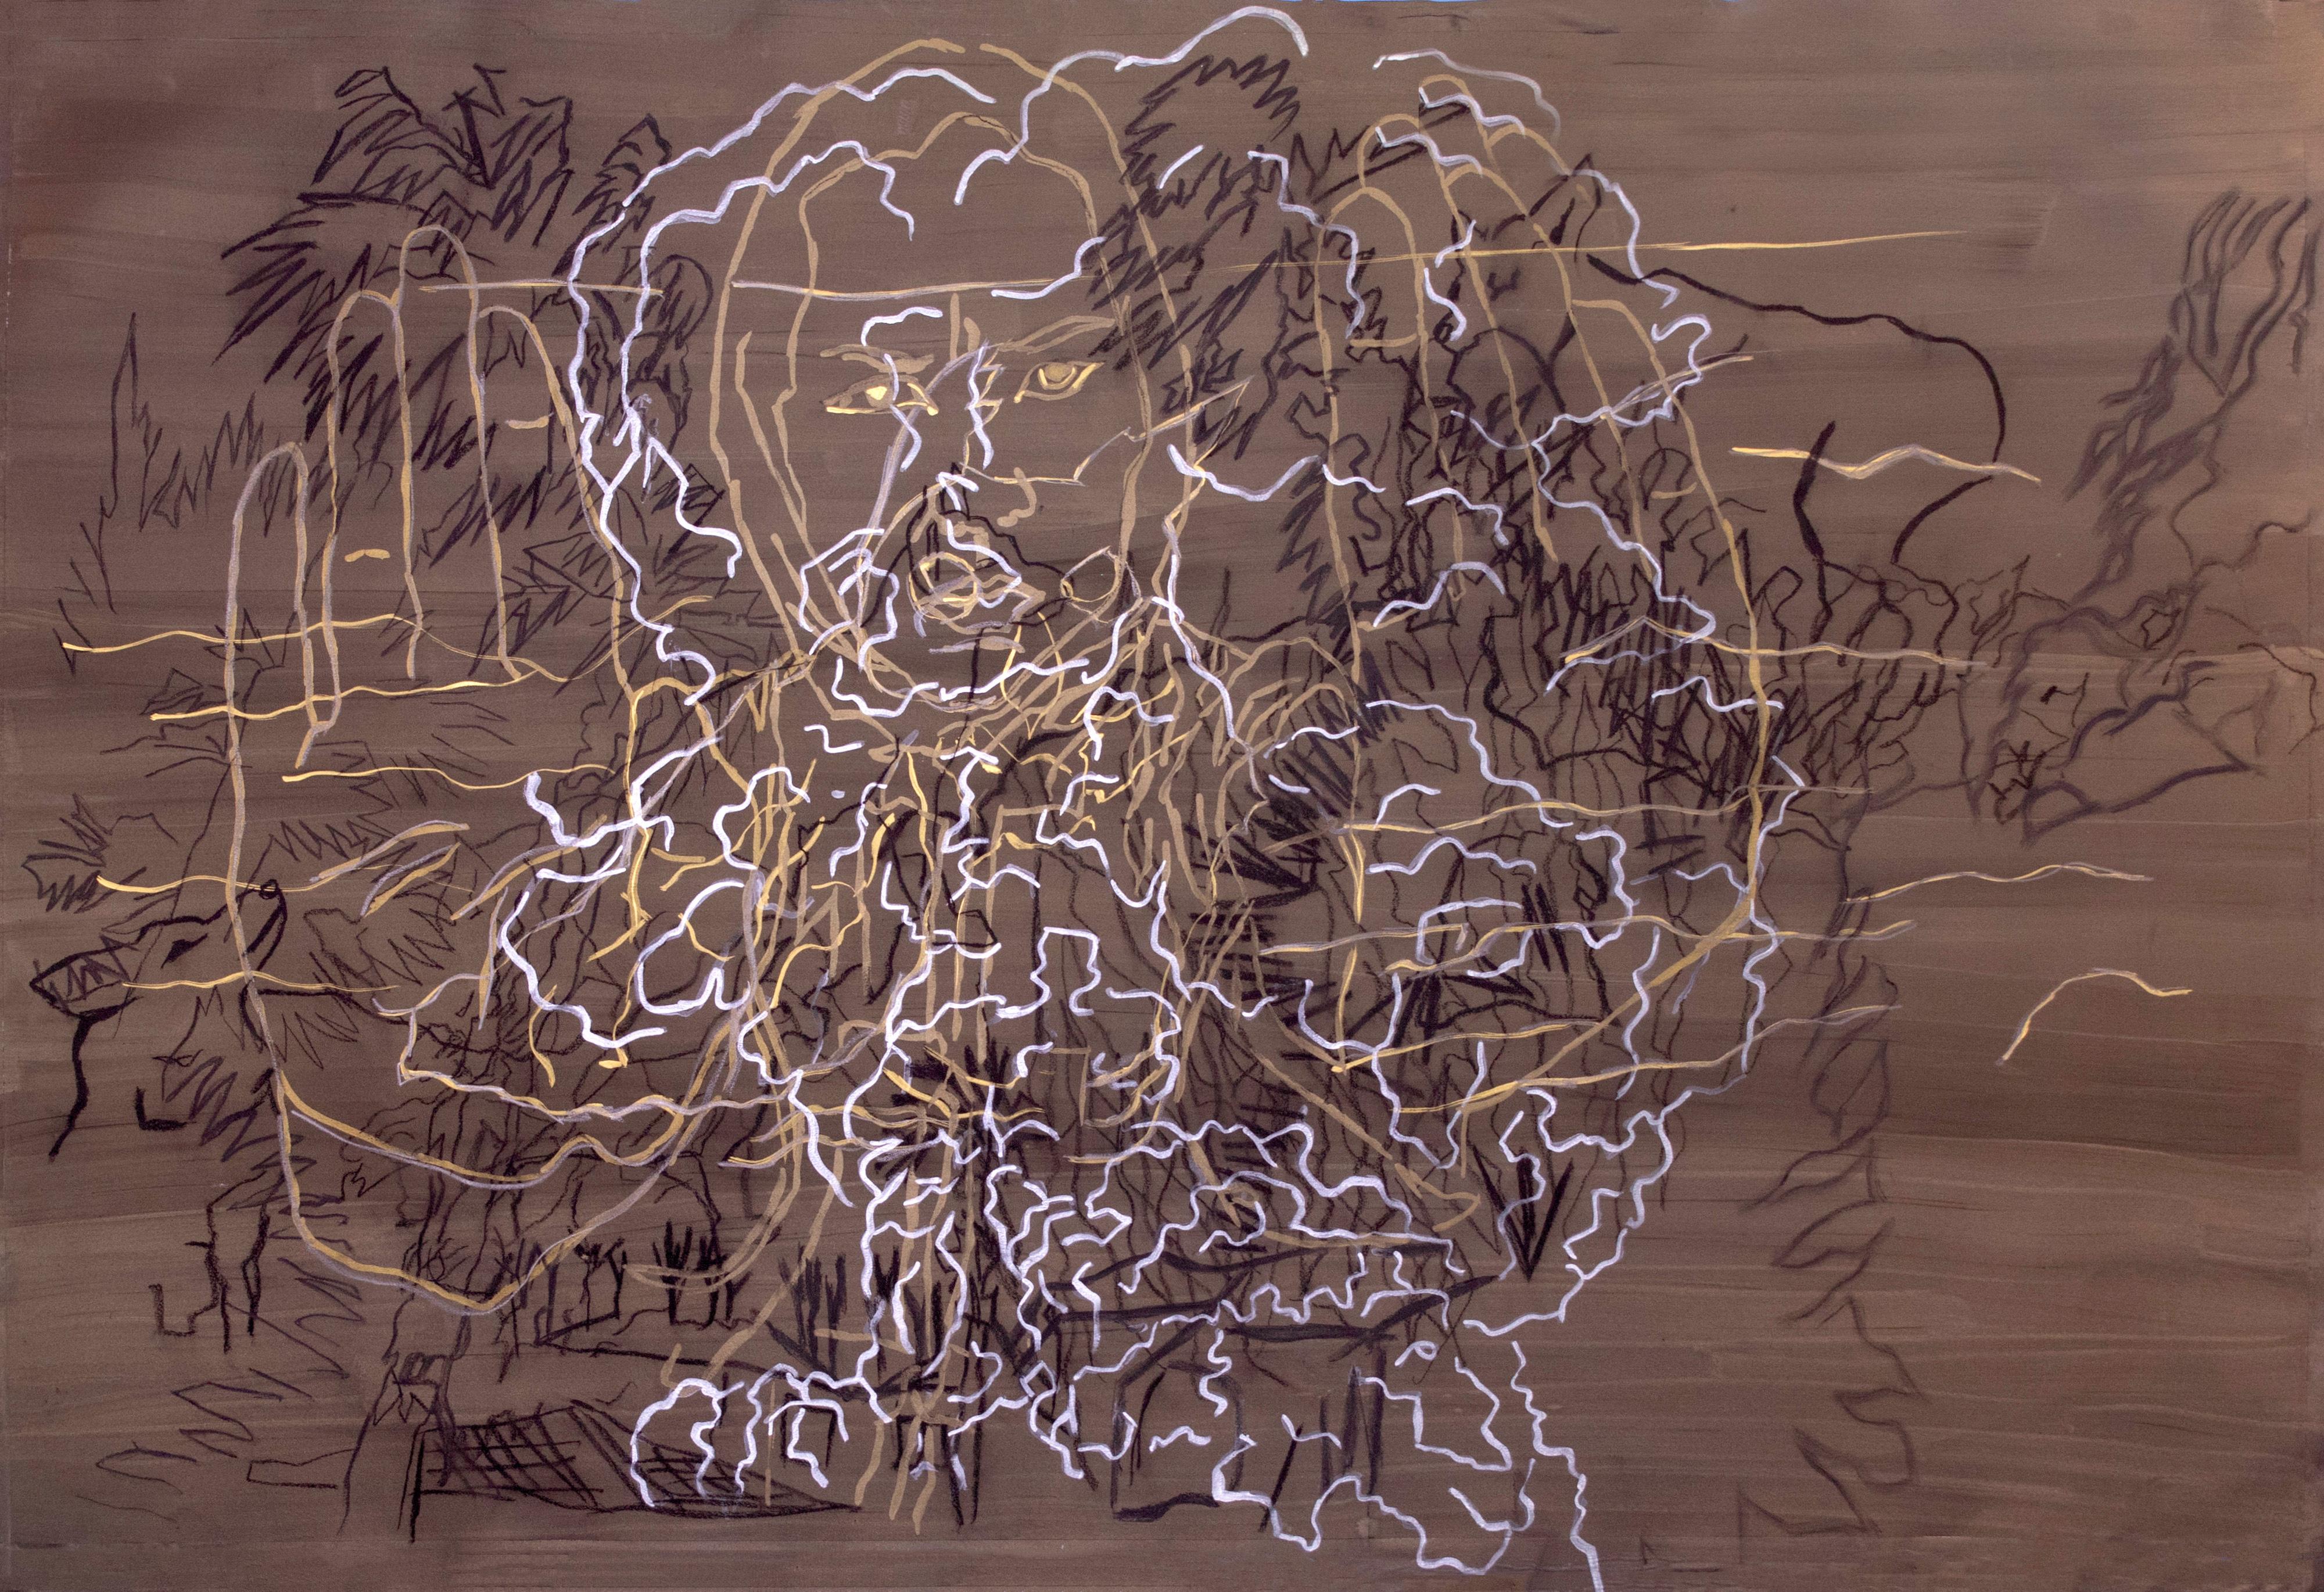 Galerie Barbara Thumm \ New Viewings #18 \ New Viewings #18